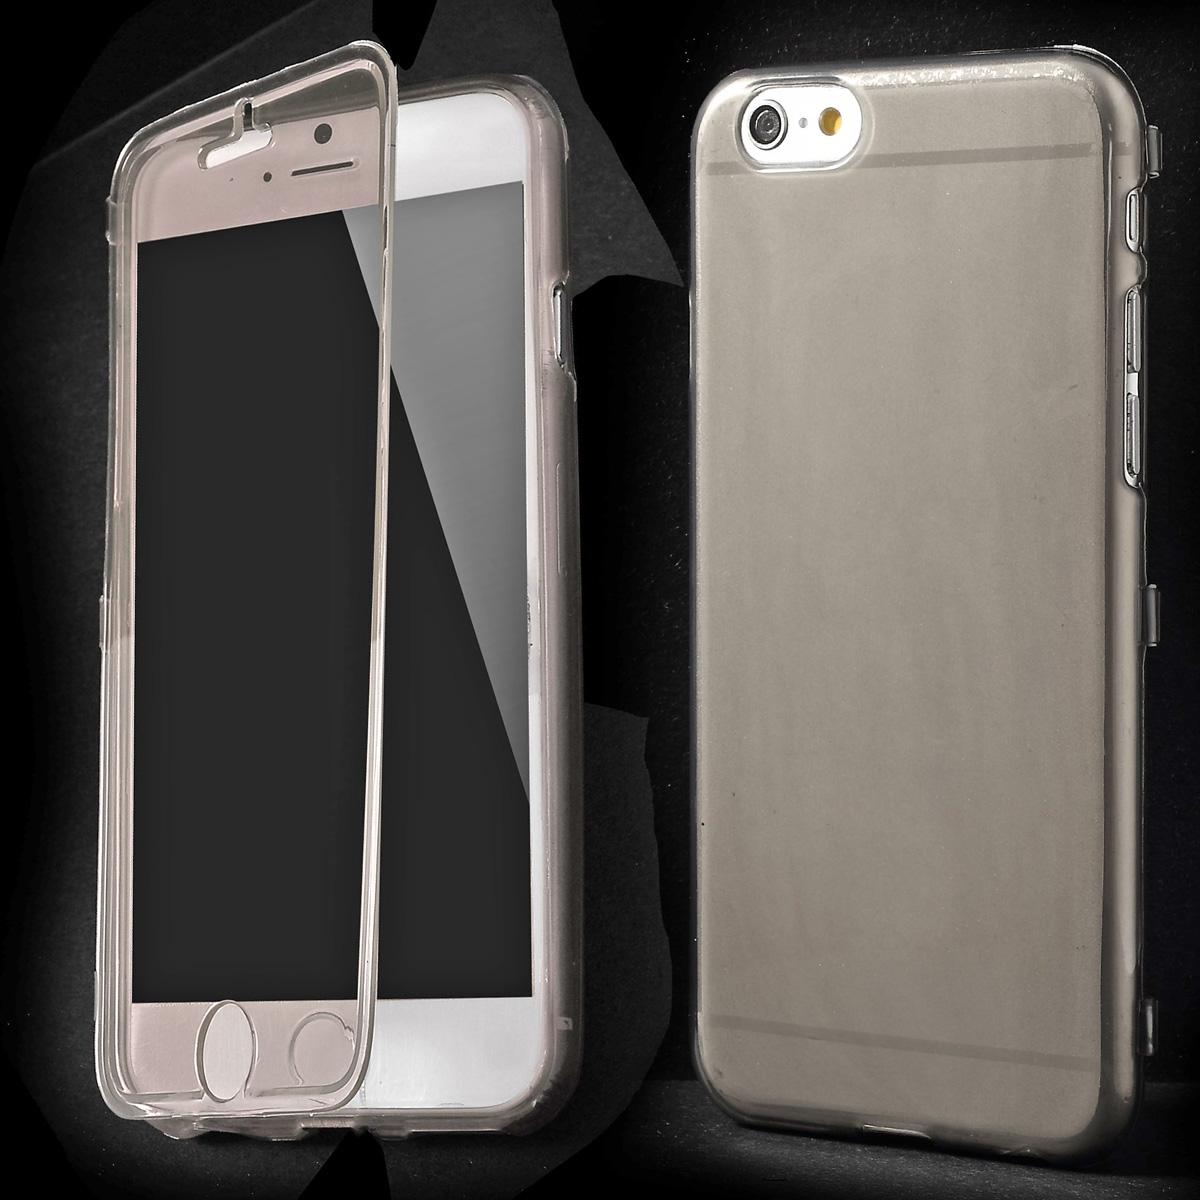 iPhone 6 TPU Hülle mit Klappe - grau